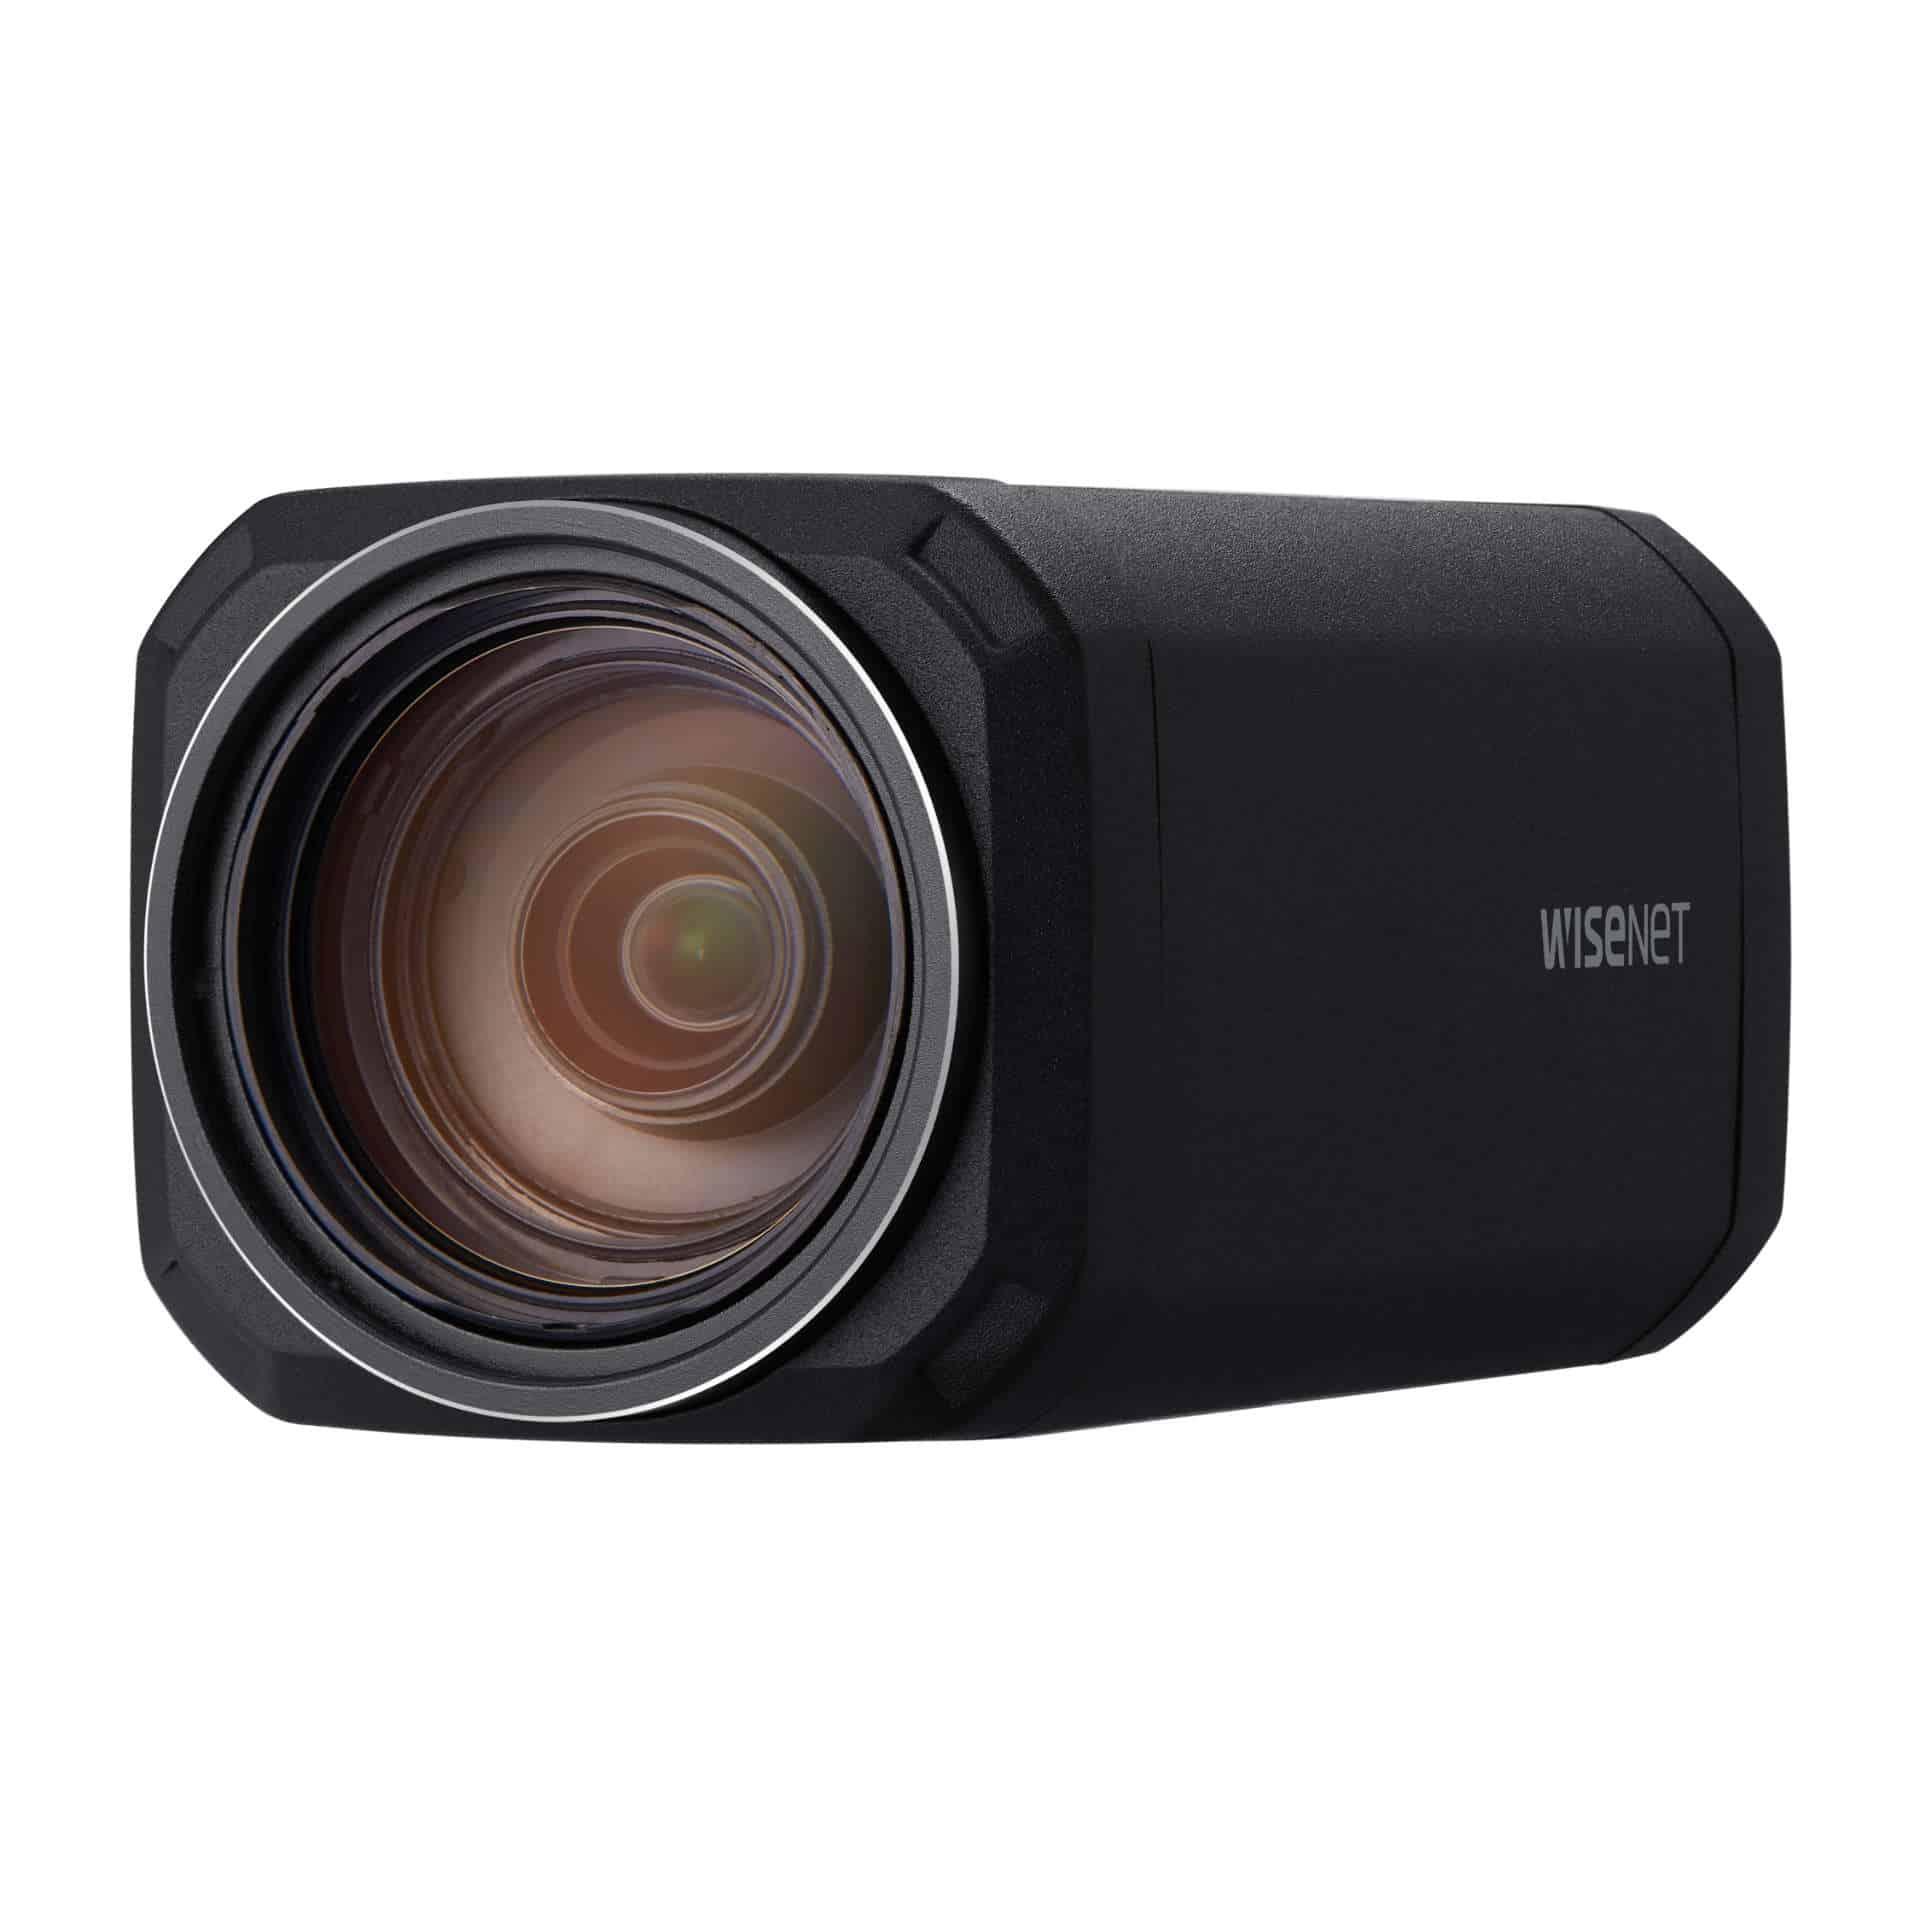 XNZ-L6320 2M H.265 Network 32x Zoom Camera